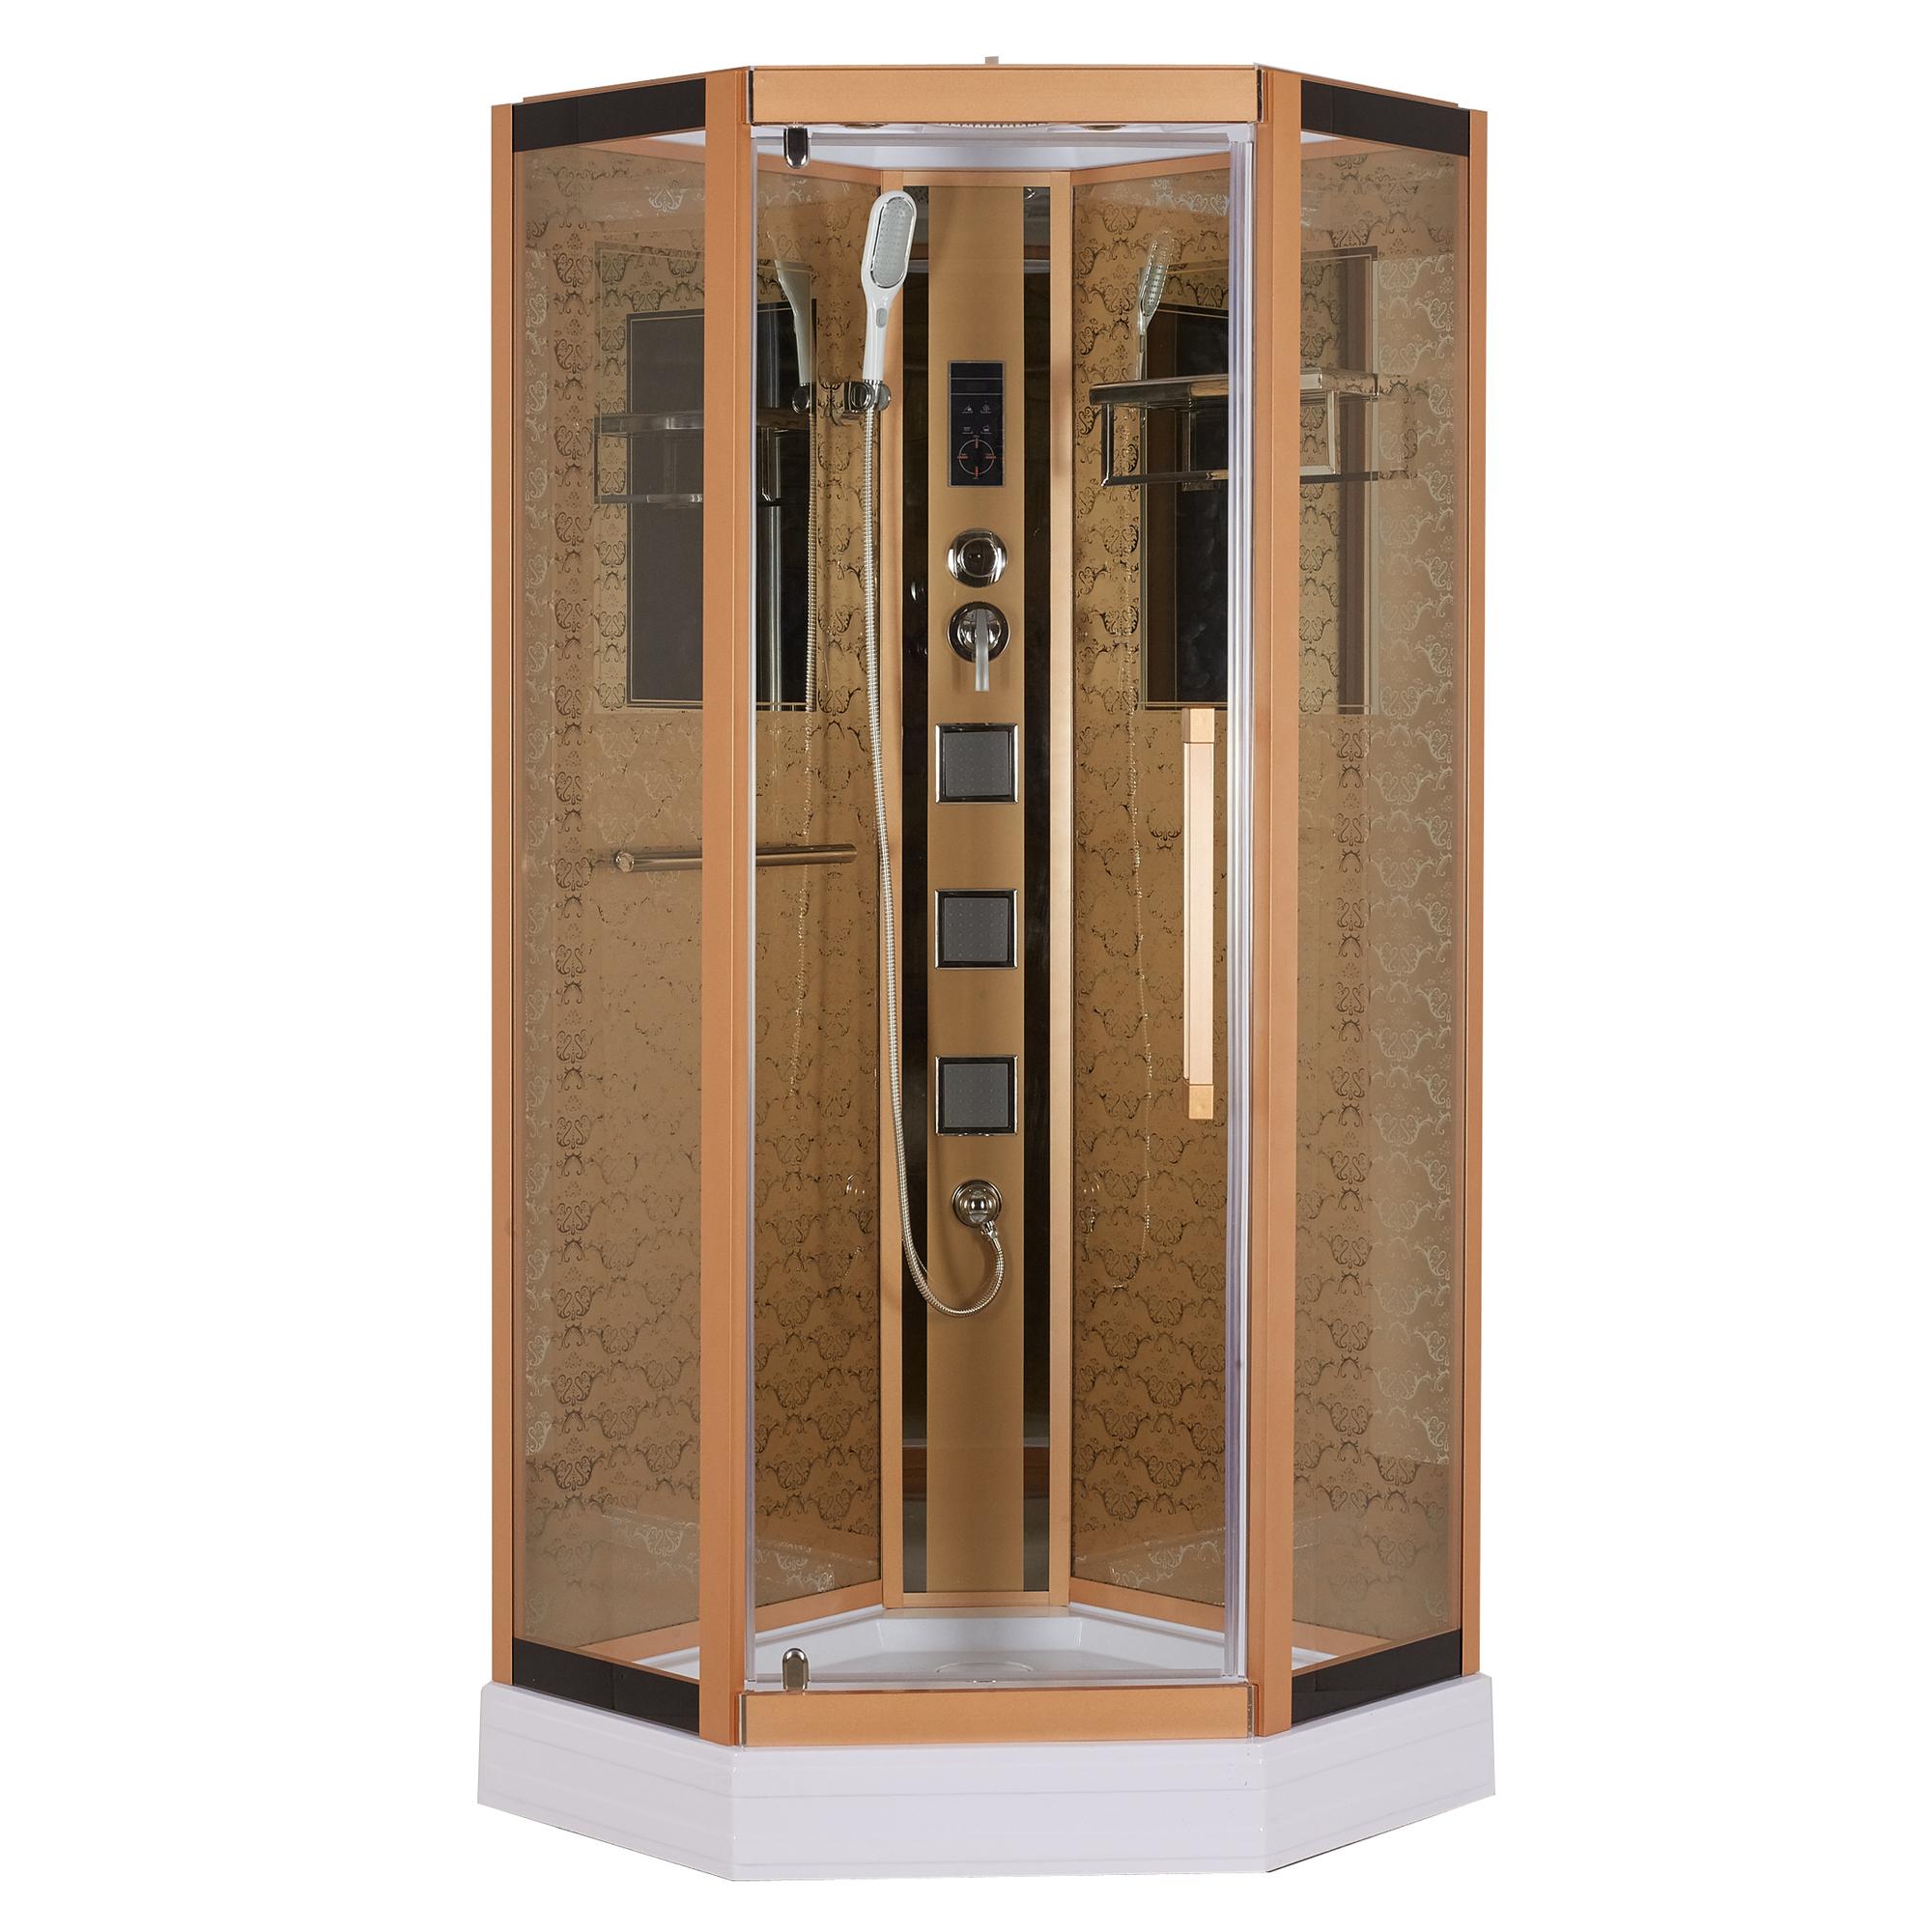 Душевая кабина Niagara Lux 7799G золото открытая душевая кабина triton стандарт б1 90x90 белая